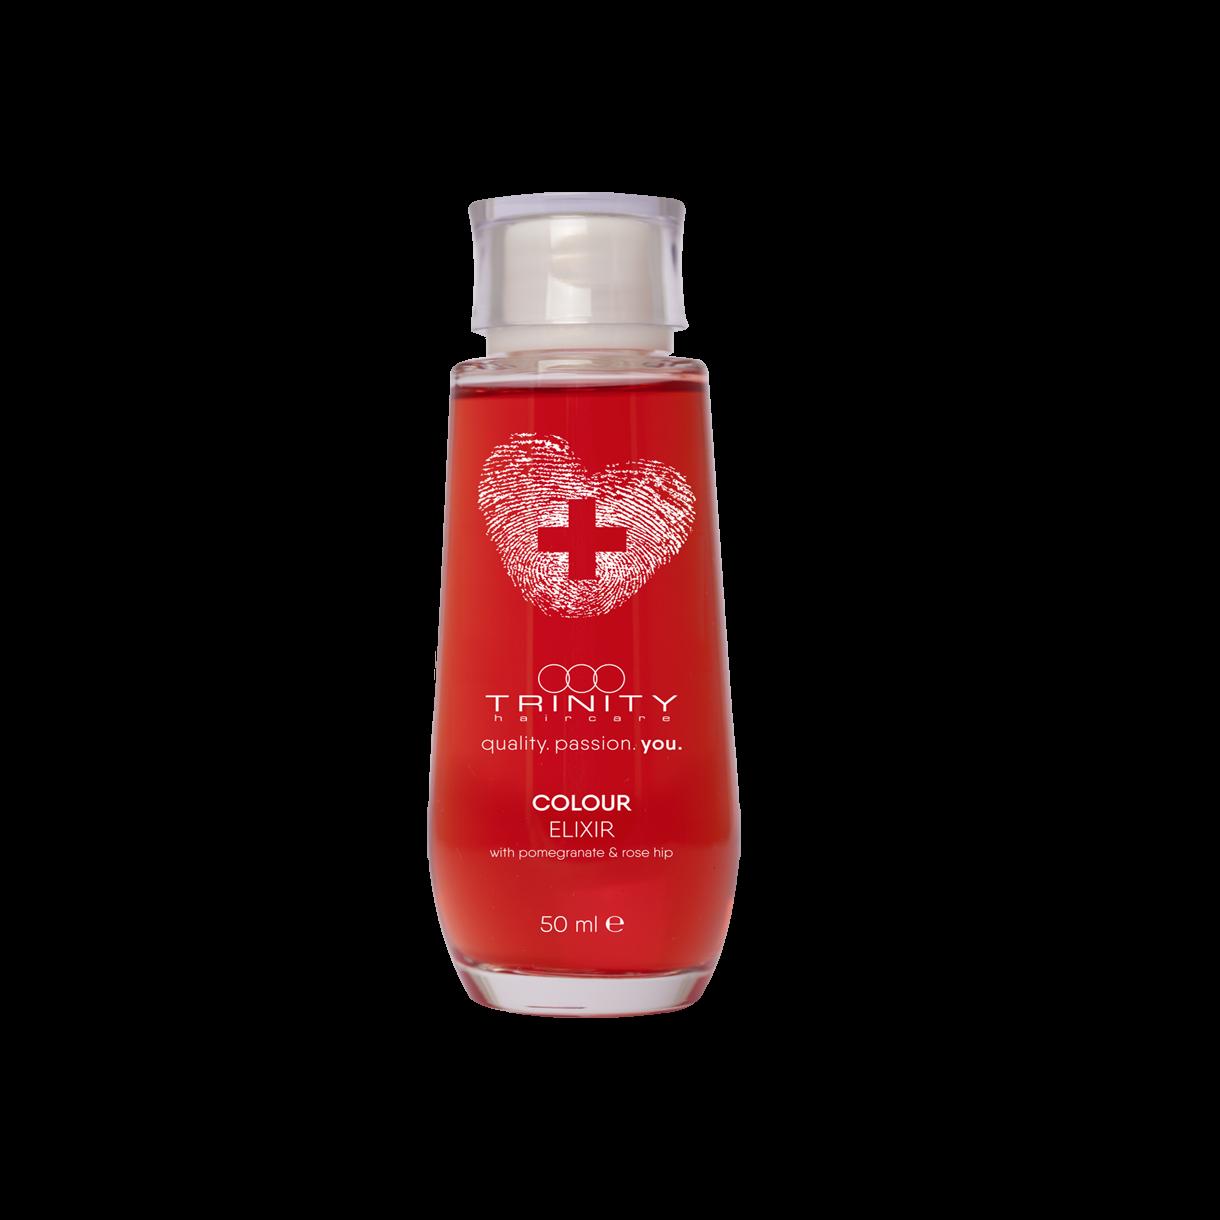 Trinity Hair Care Эликсир Essentials Colour Elixir для Окрашенных Волос, 50 мл